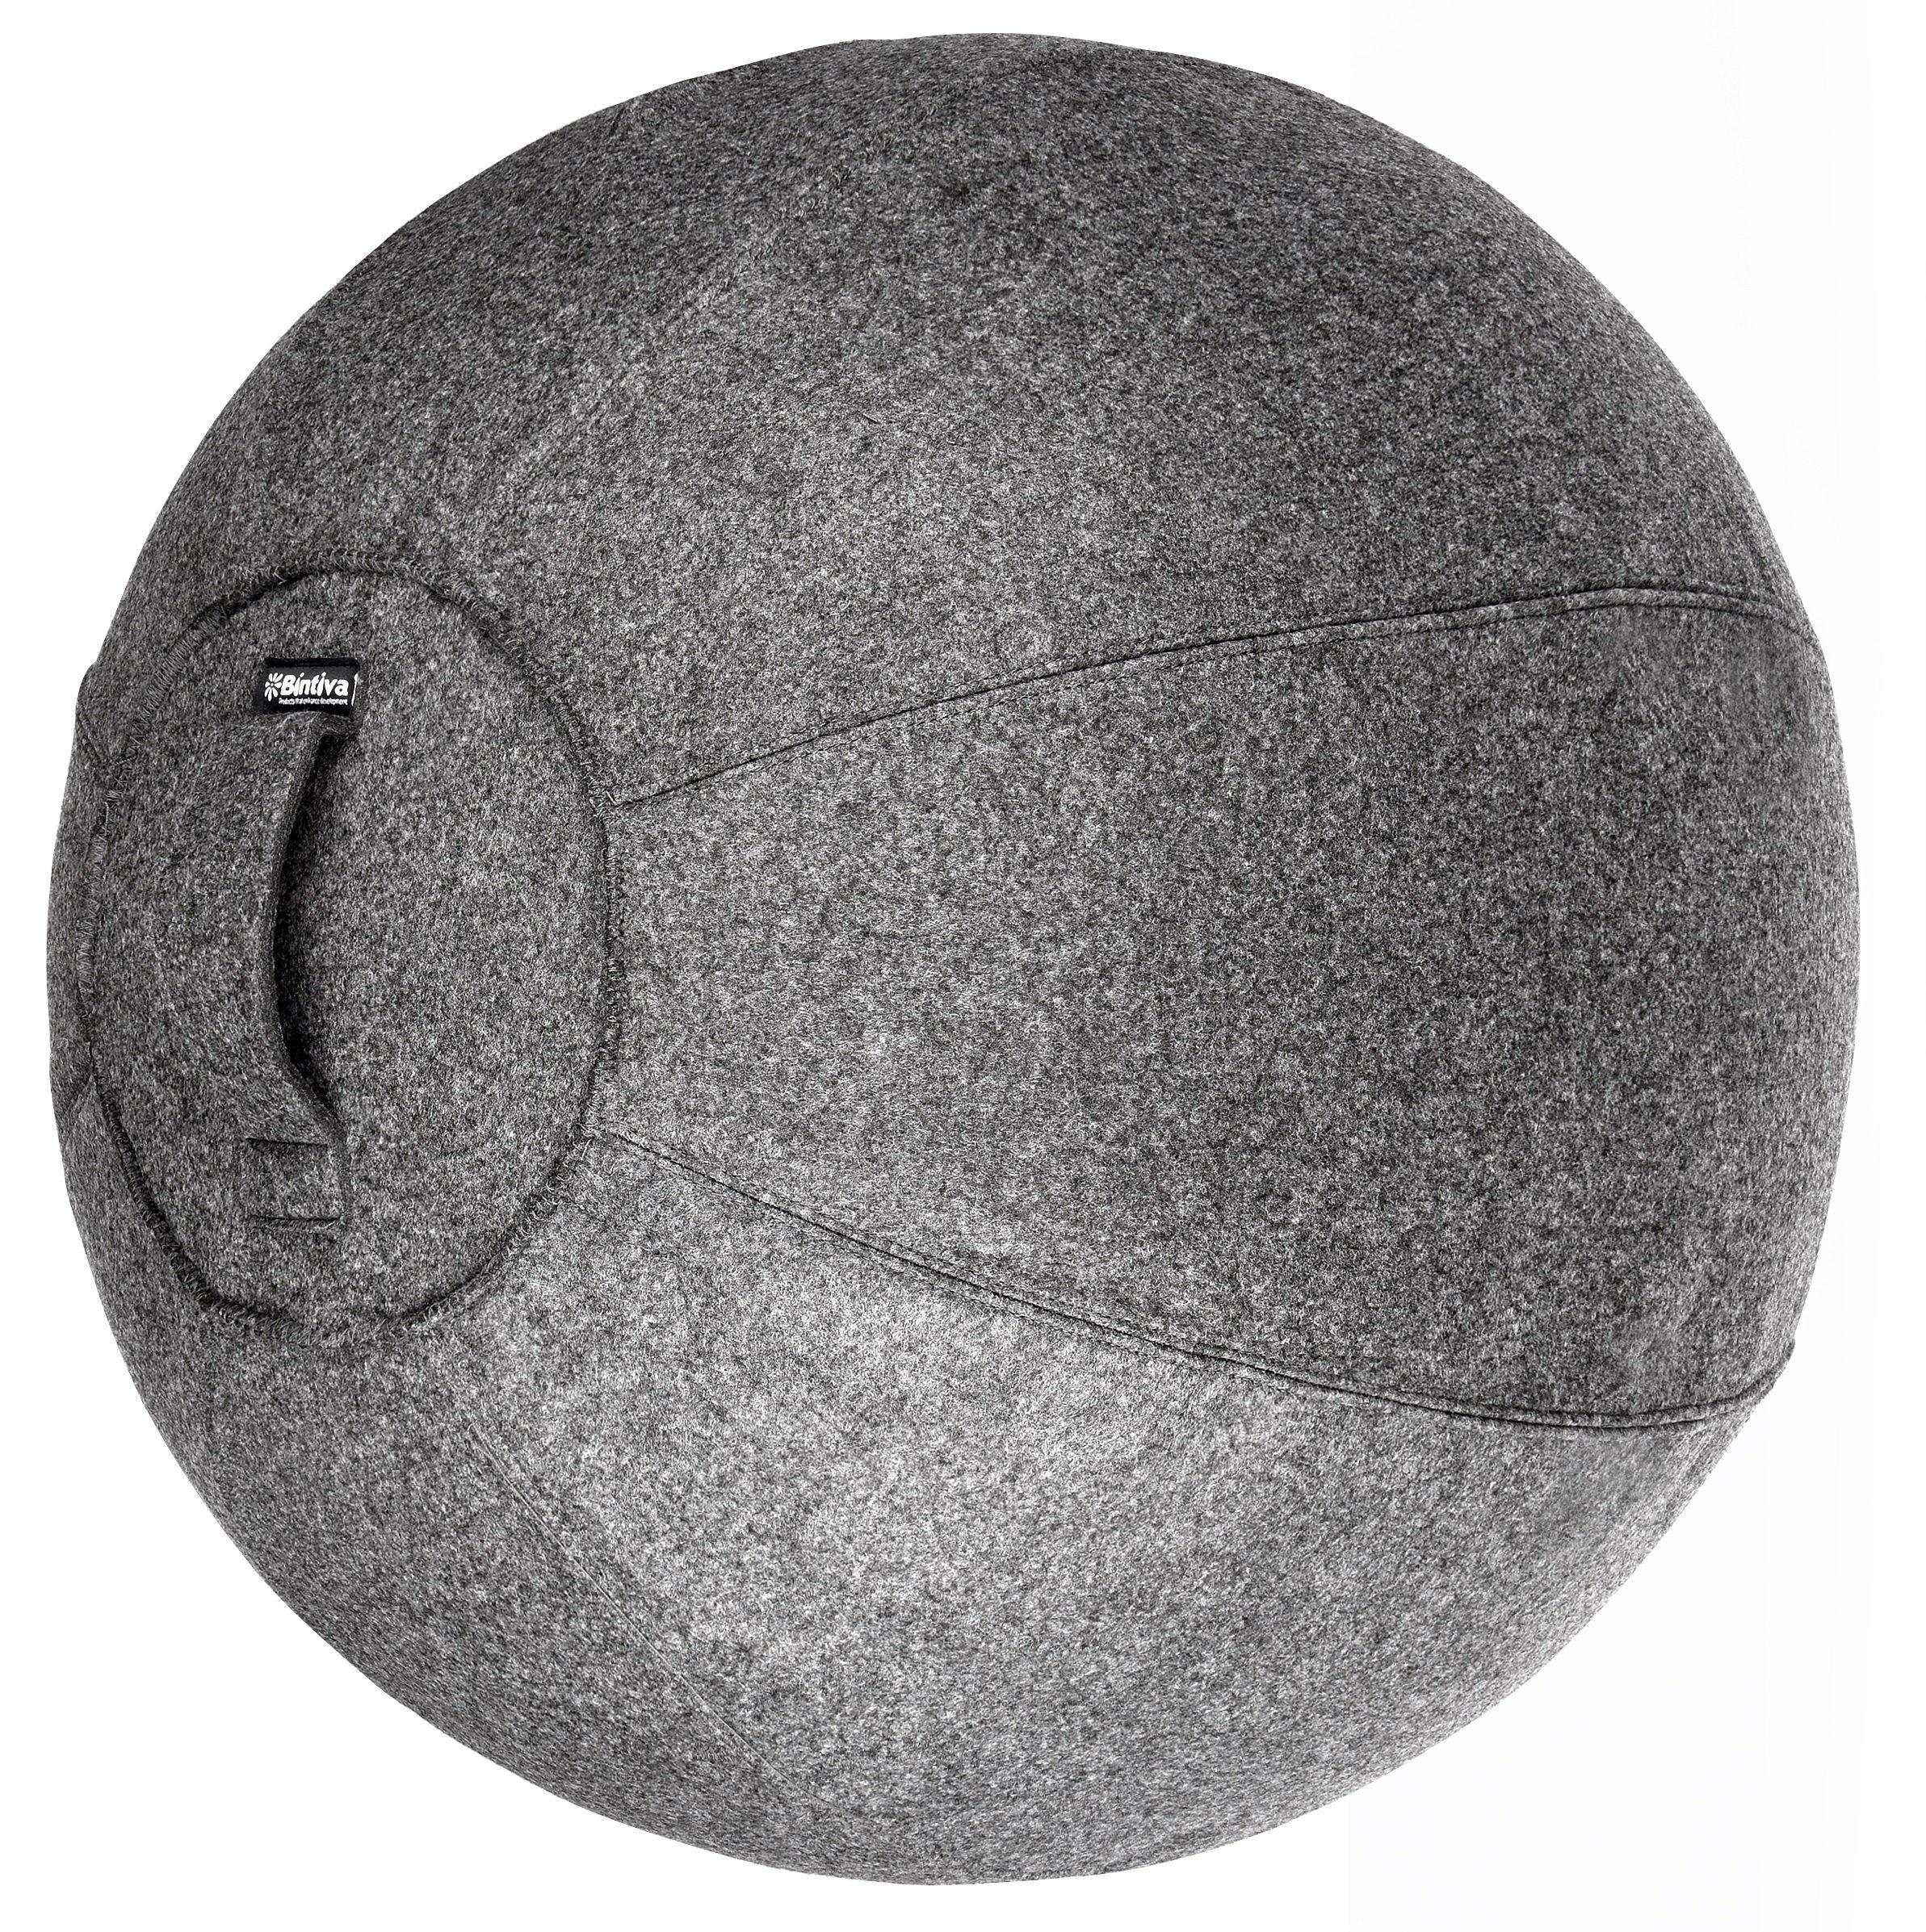 Stability Ball Chair Office Ergonomic